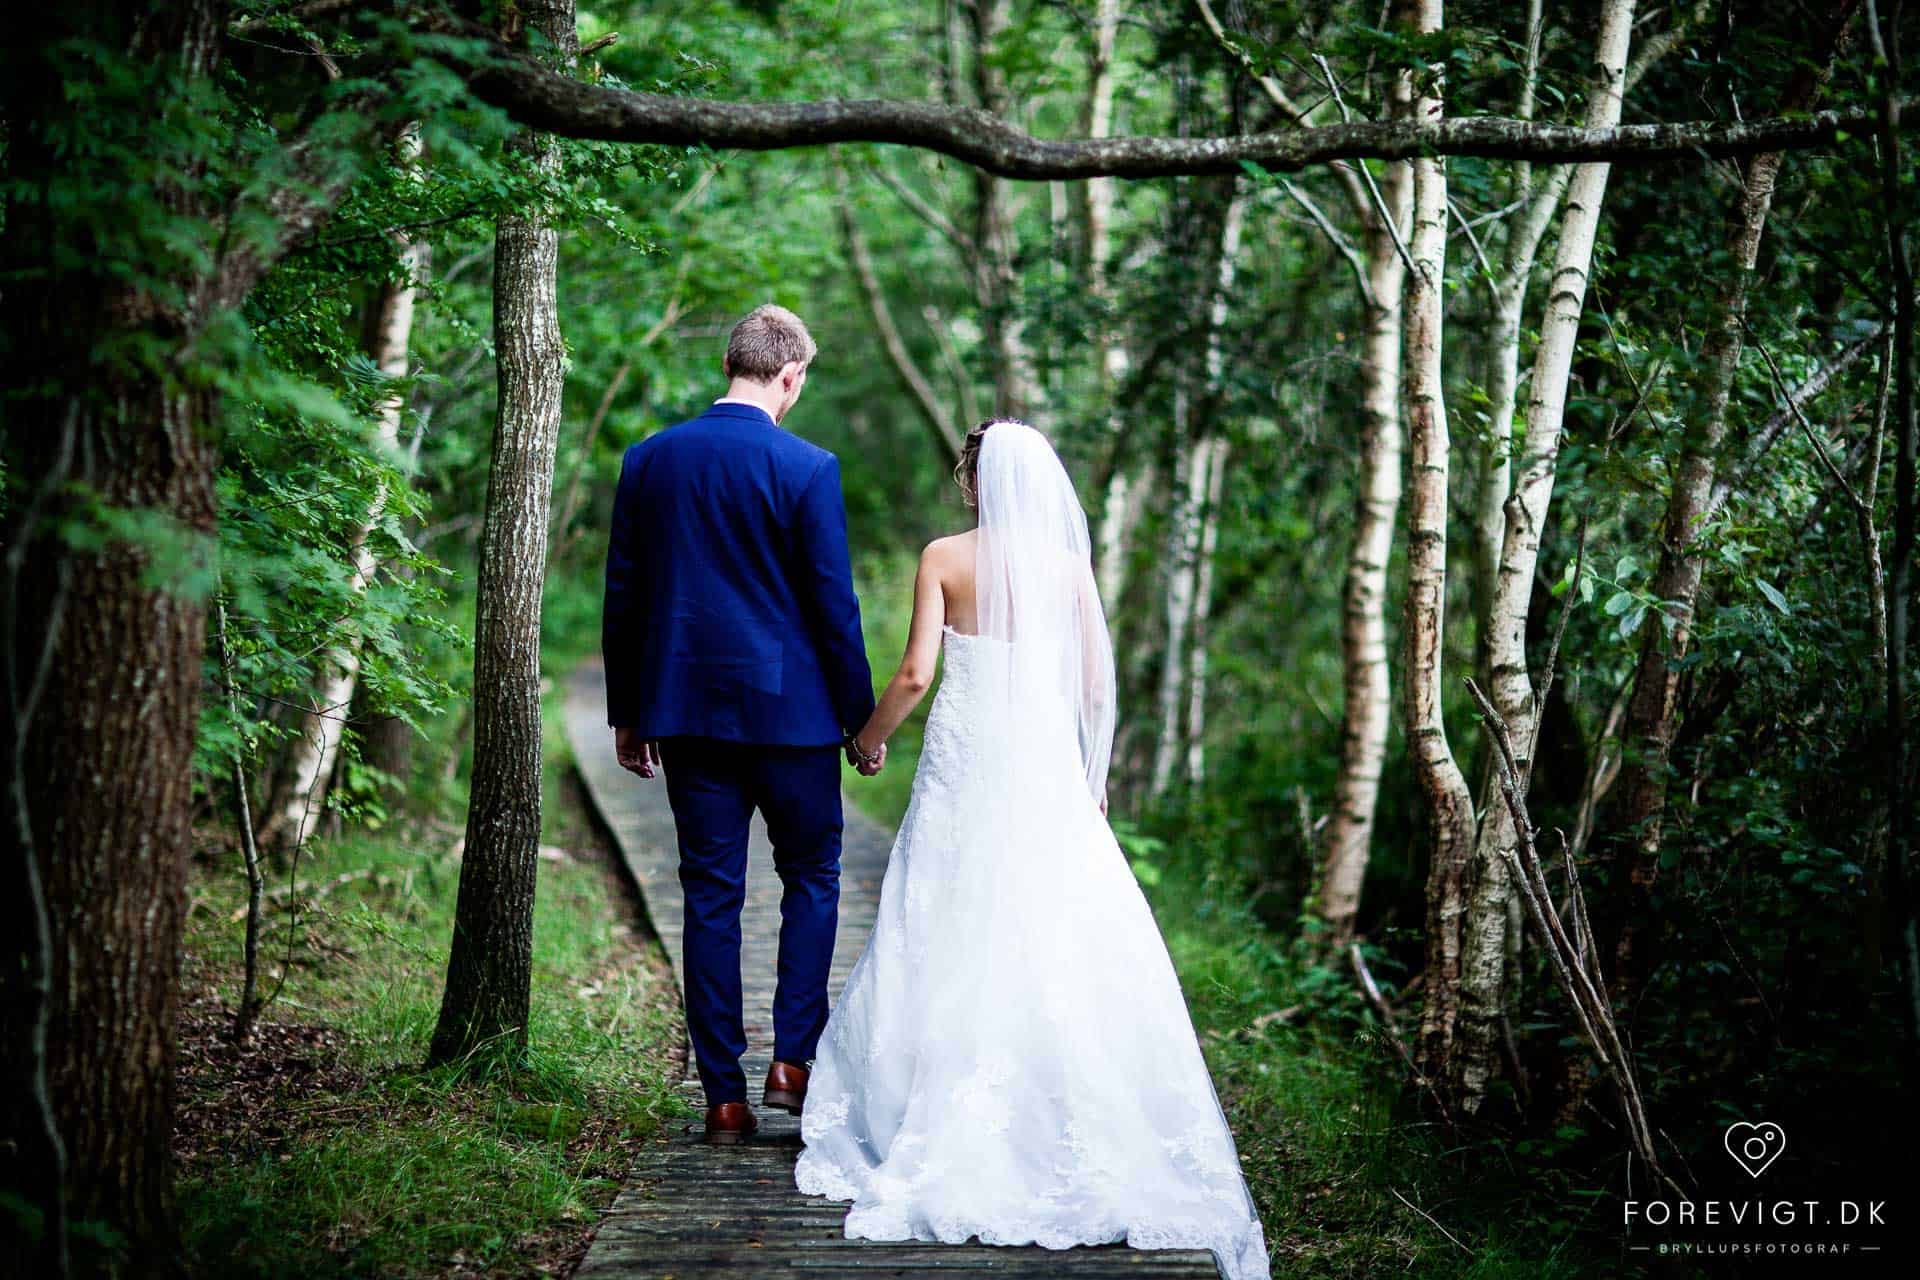 Bryllupsbilleder i Dronninglund Nordjylland